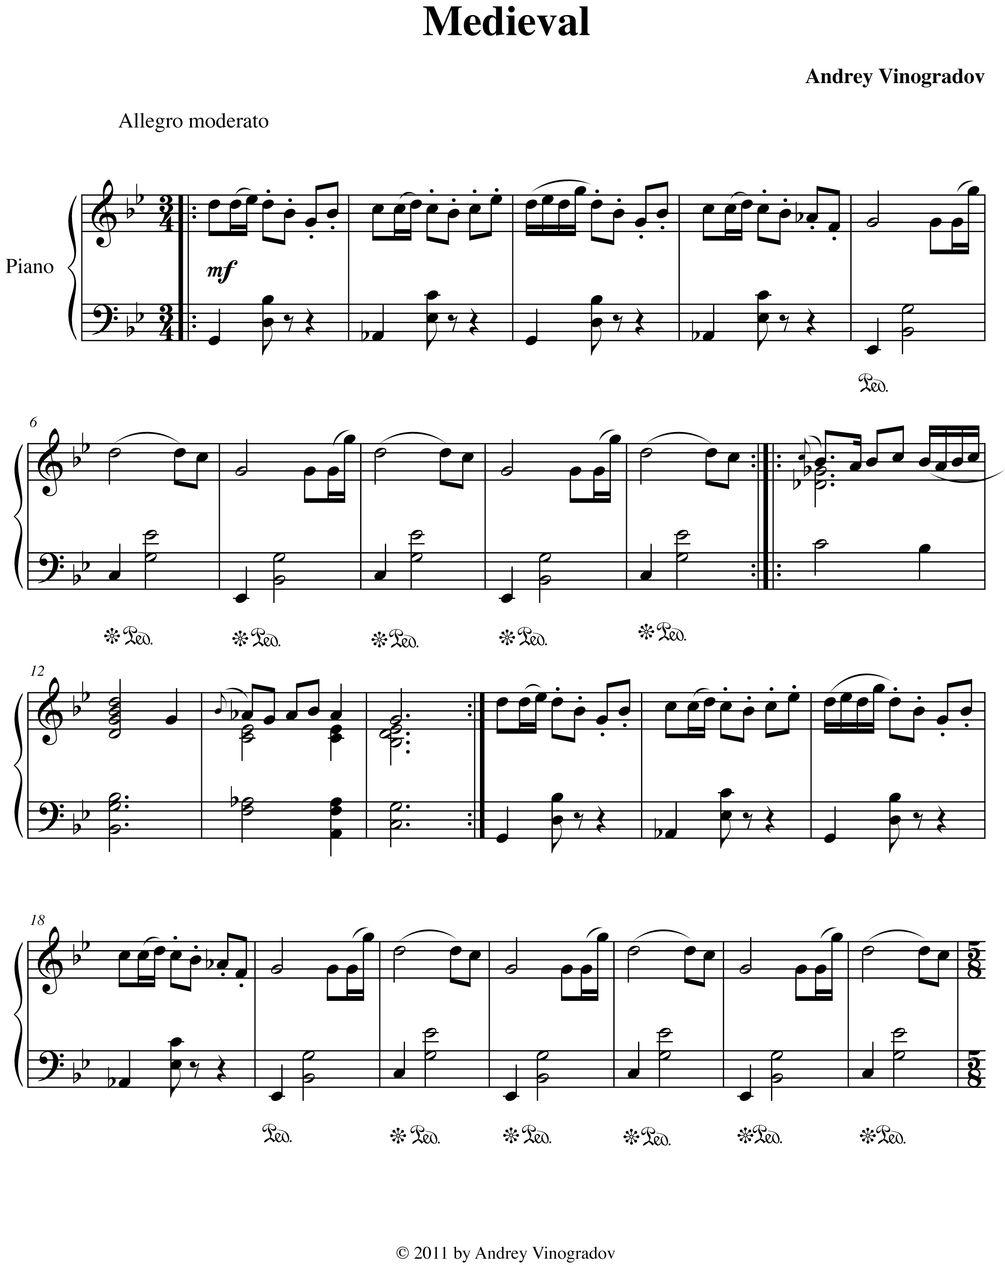 Medieval Medieval Music Sheet Music Piano Sheet Music